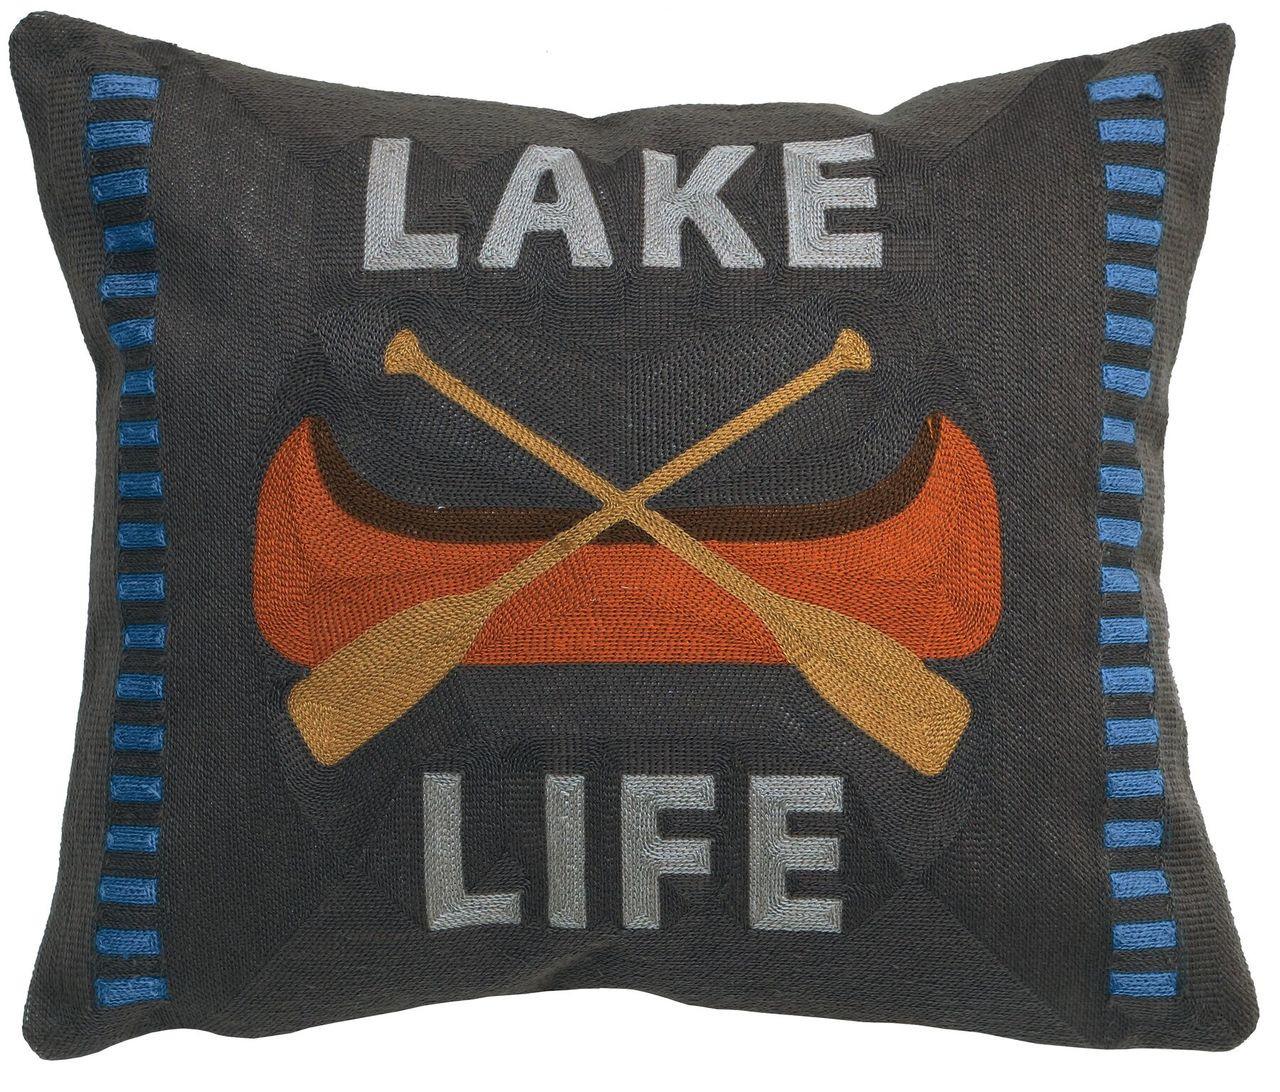 Lake Life Pillow Adirondack Country Store